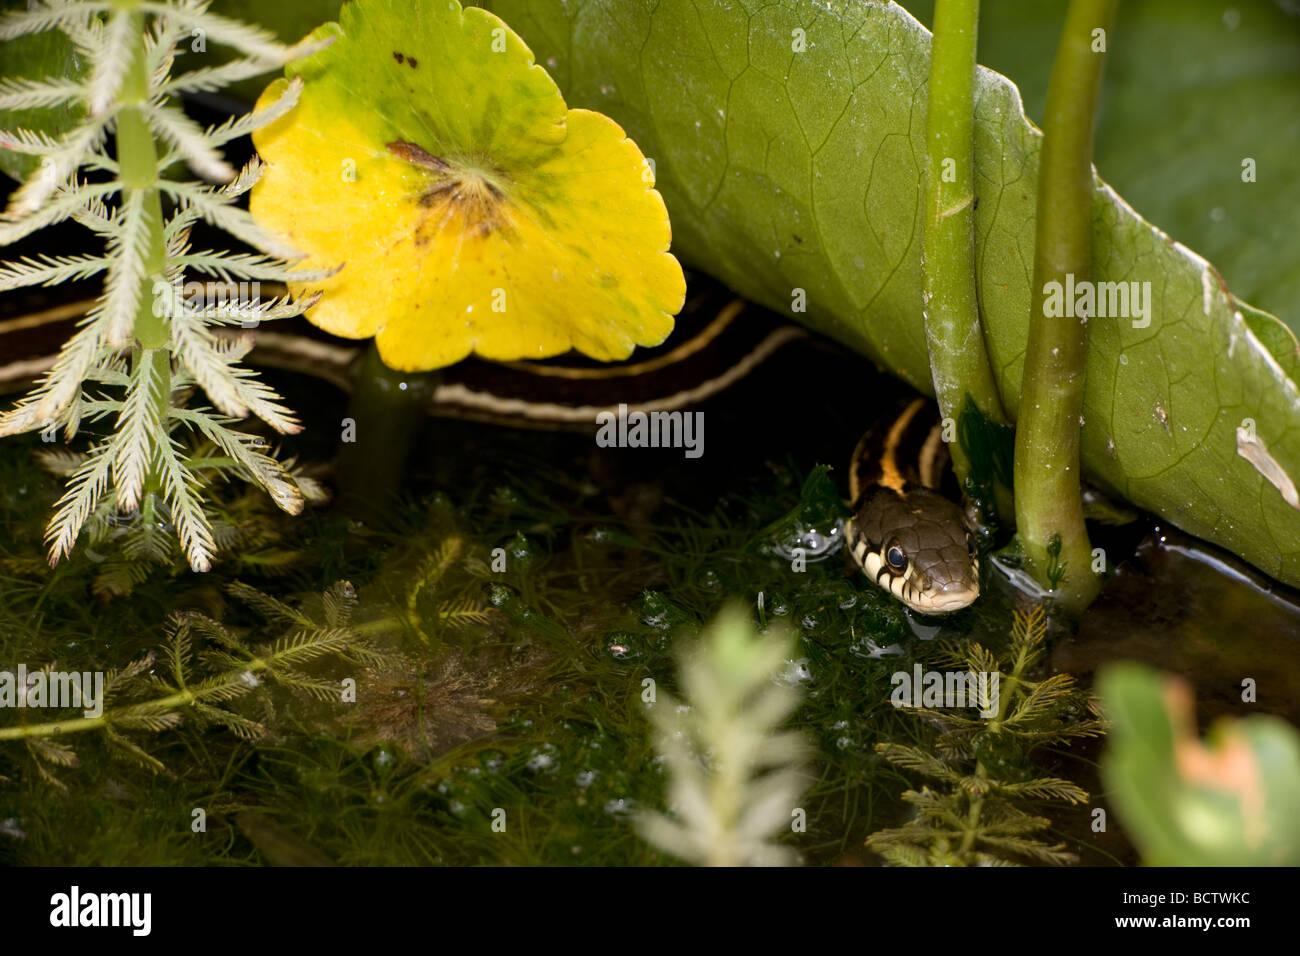 Black-necked (Thamnophis) cyrtopsis Az - USA - Semi-aquatique - dans l'étang avec des nénuphars Banque D'Images